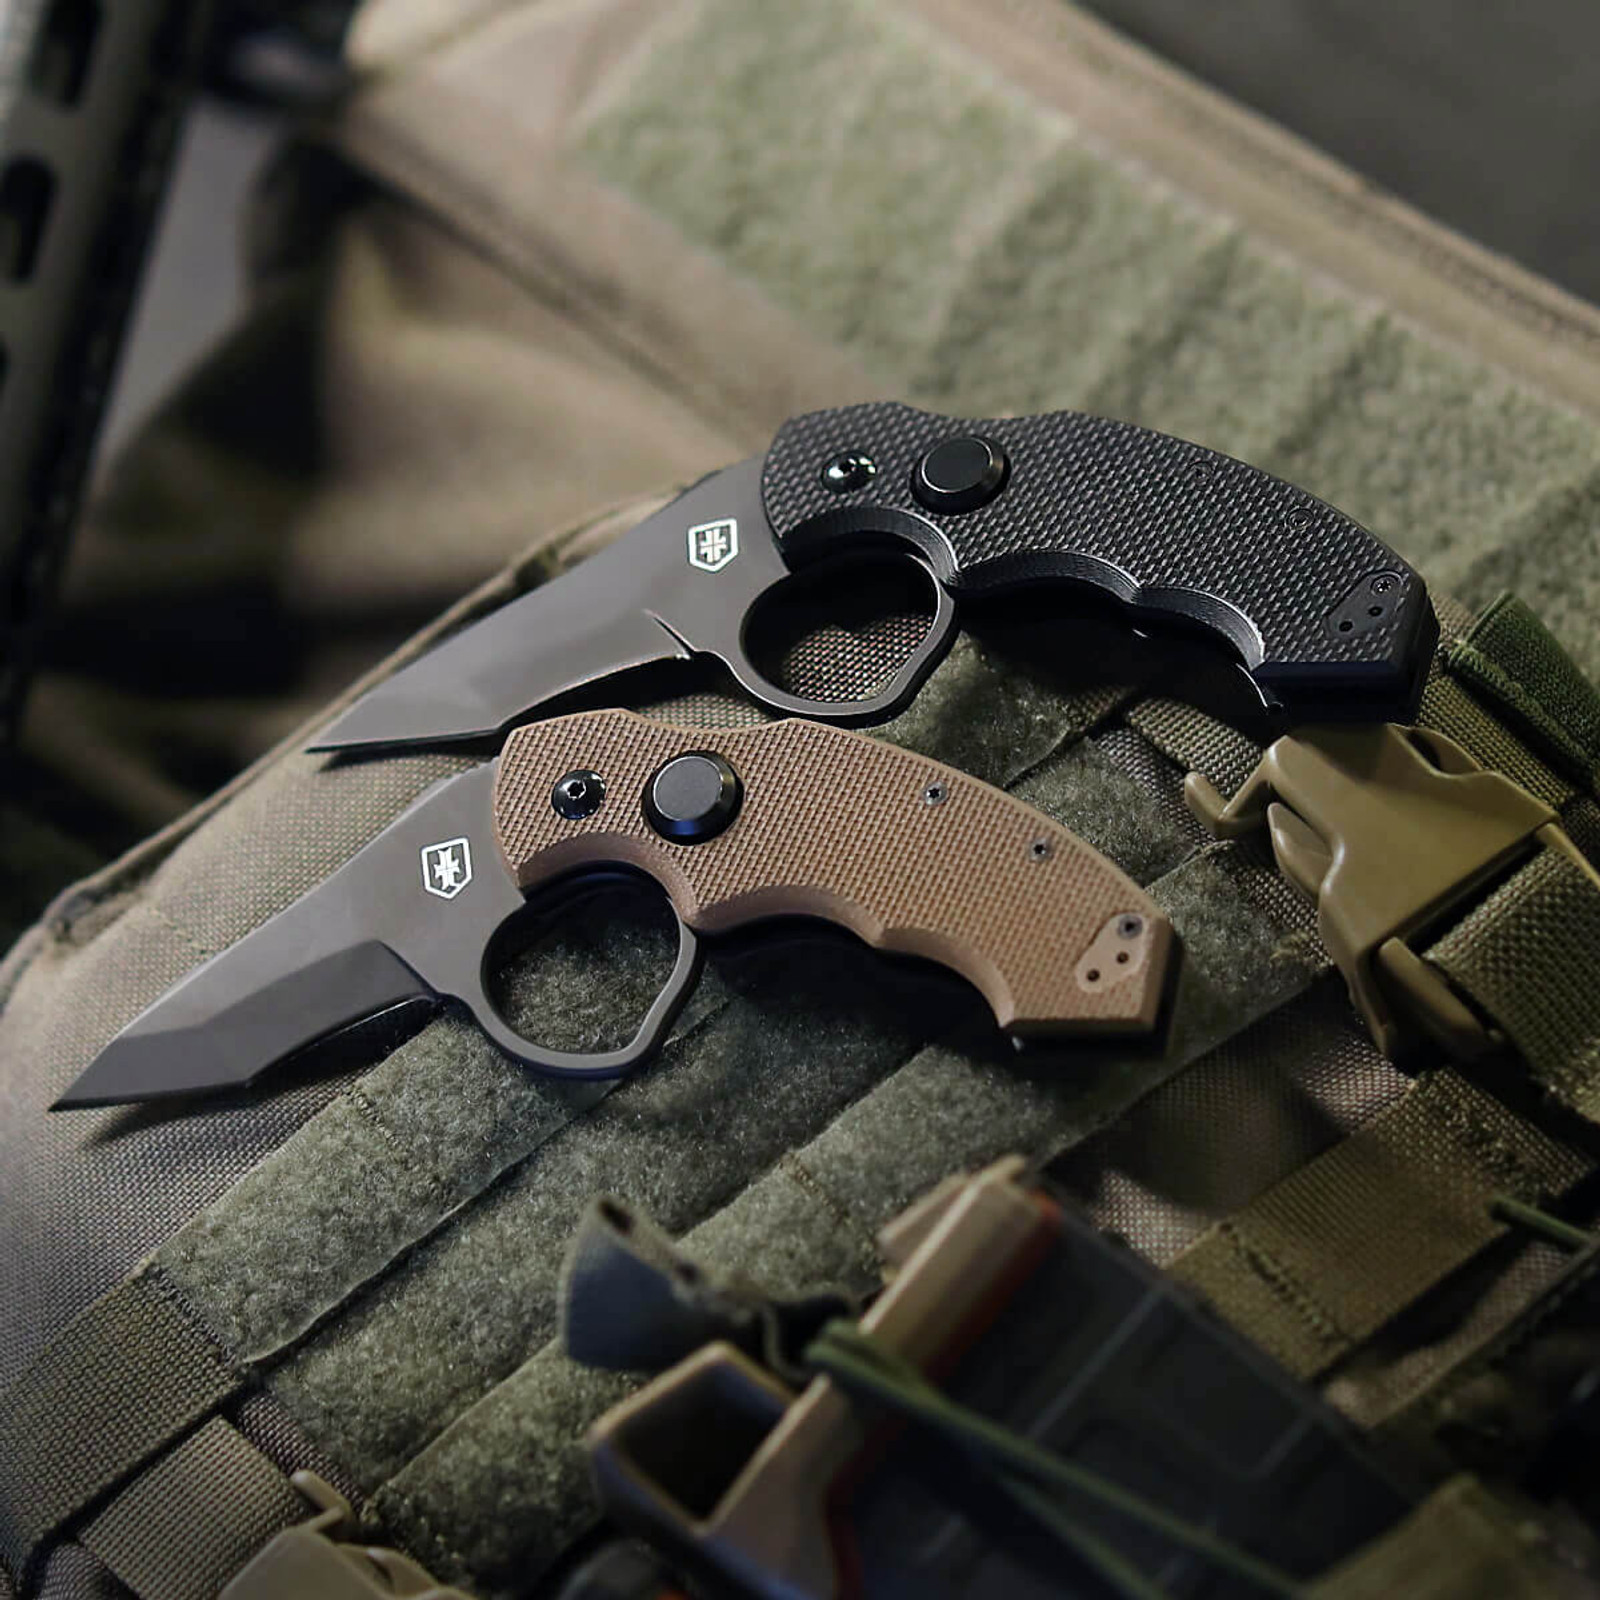 WPS Fox Folder Knife - Coyote